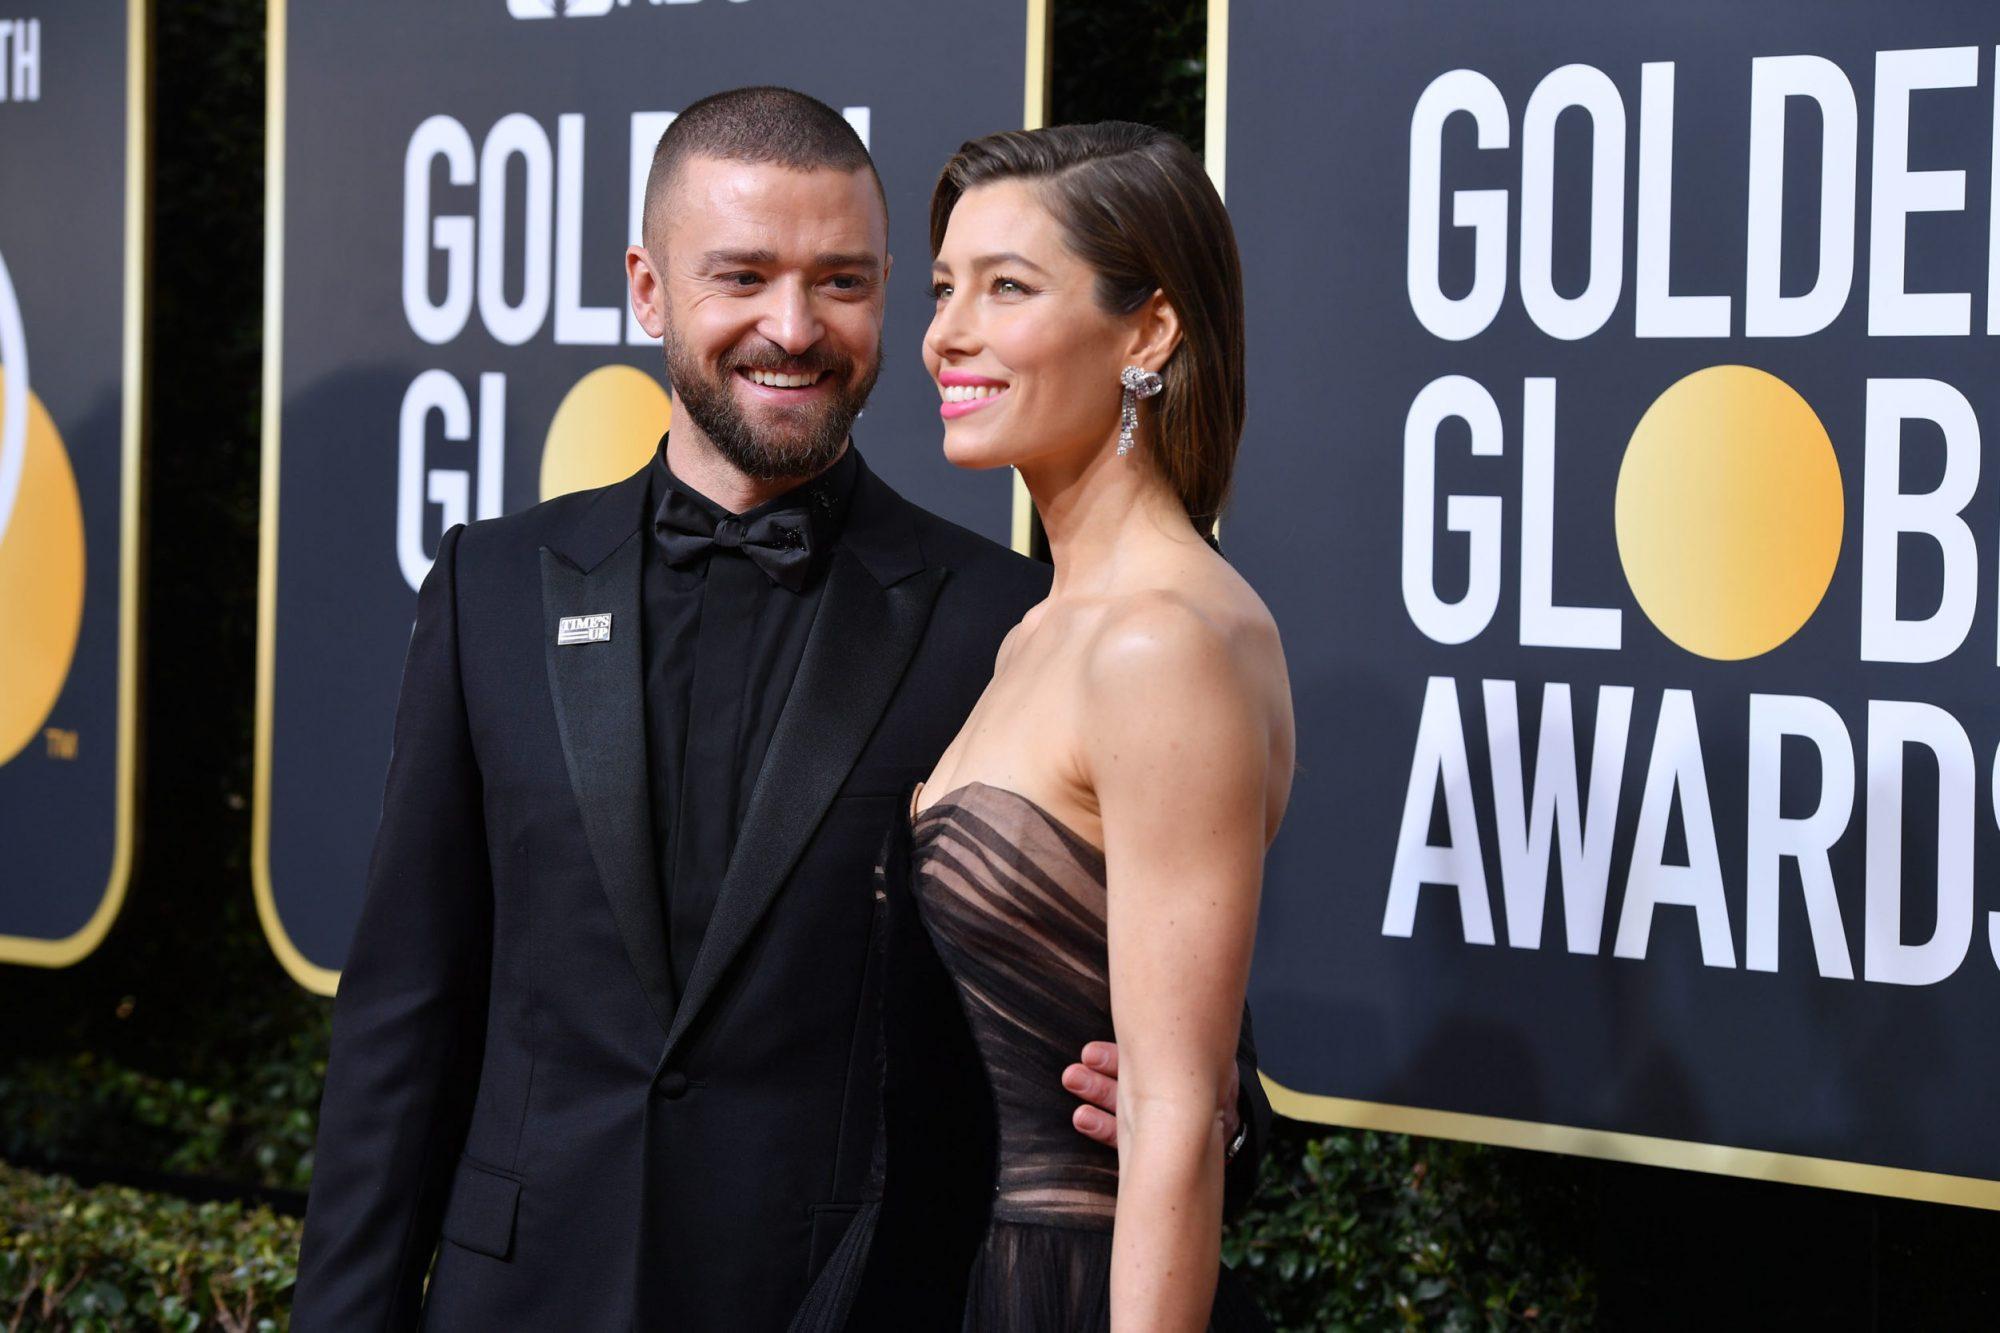 Photo of Justin Timberlake and Jessica Biel